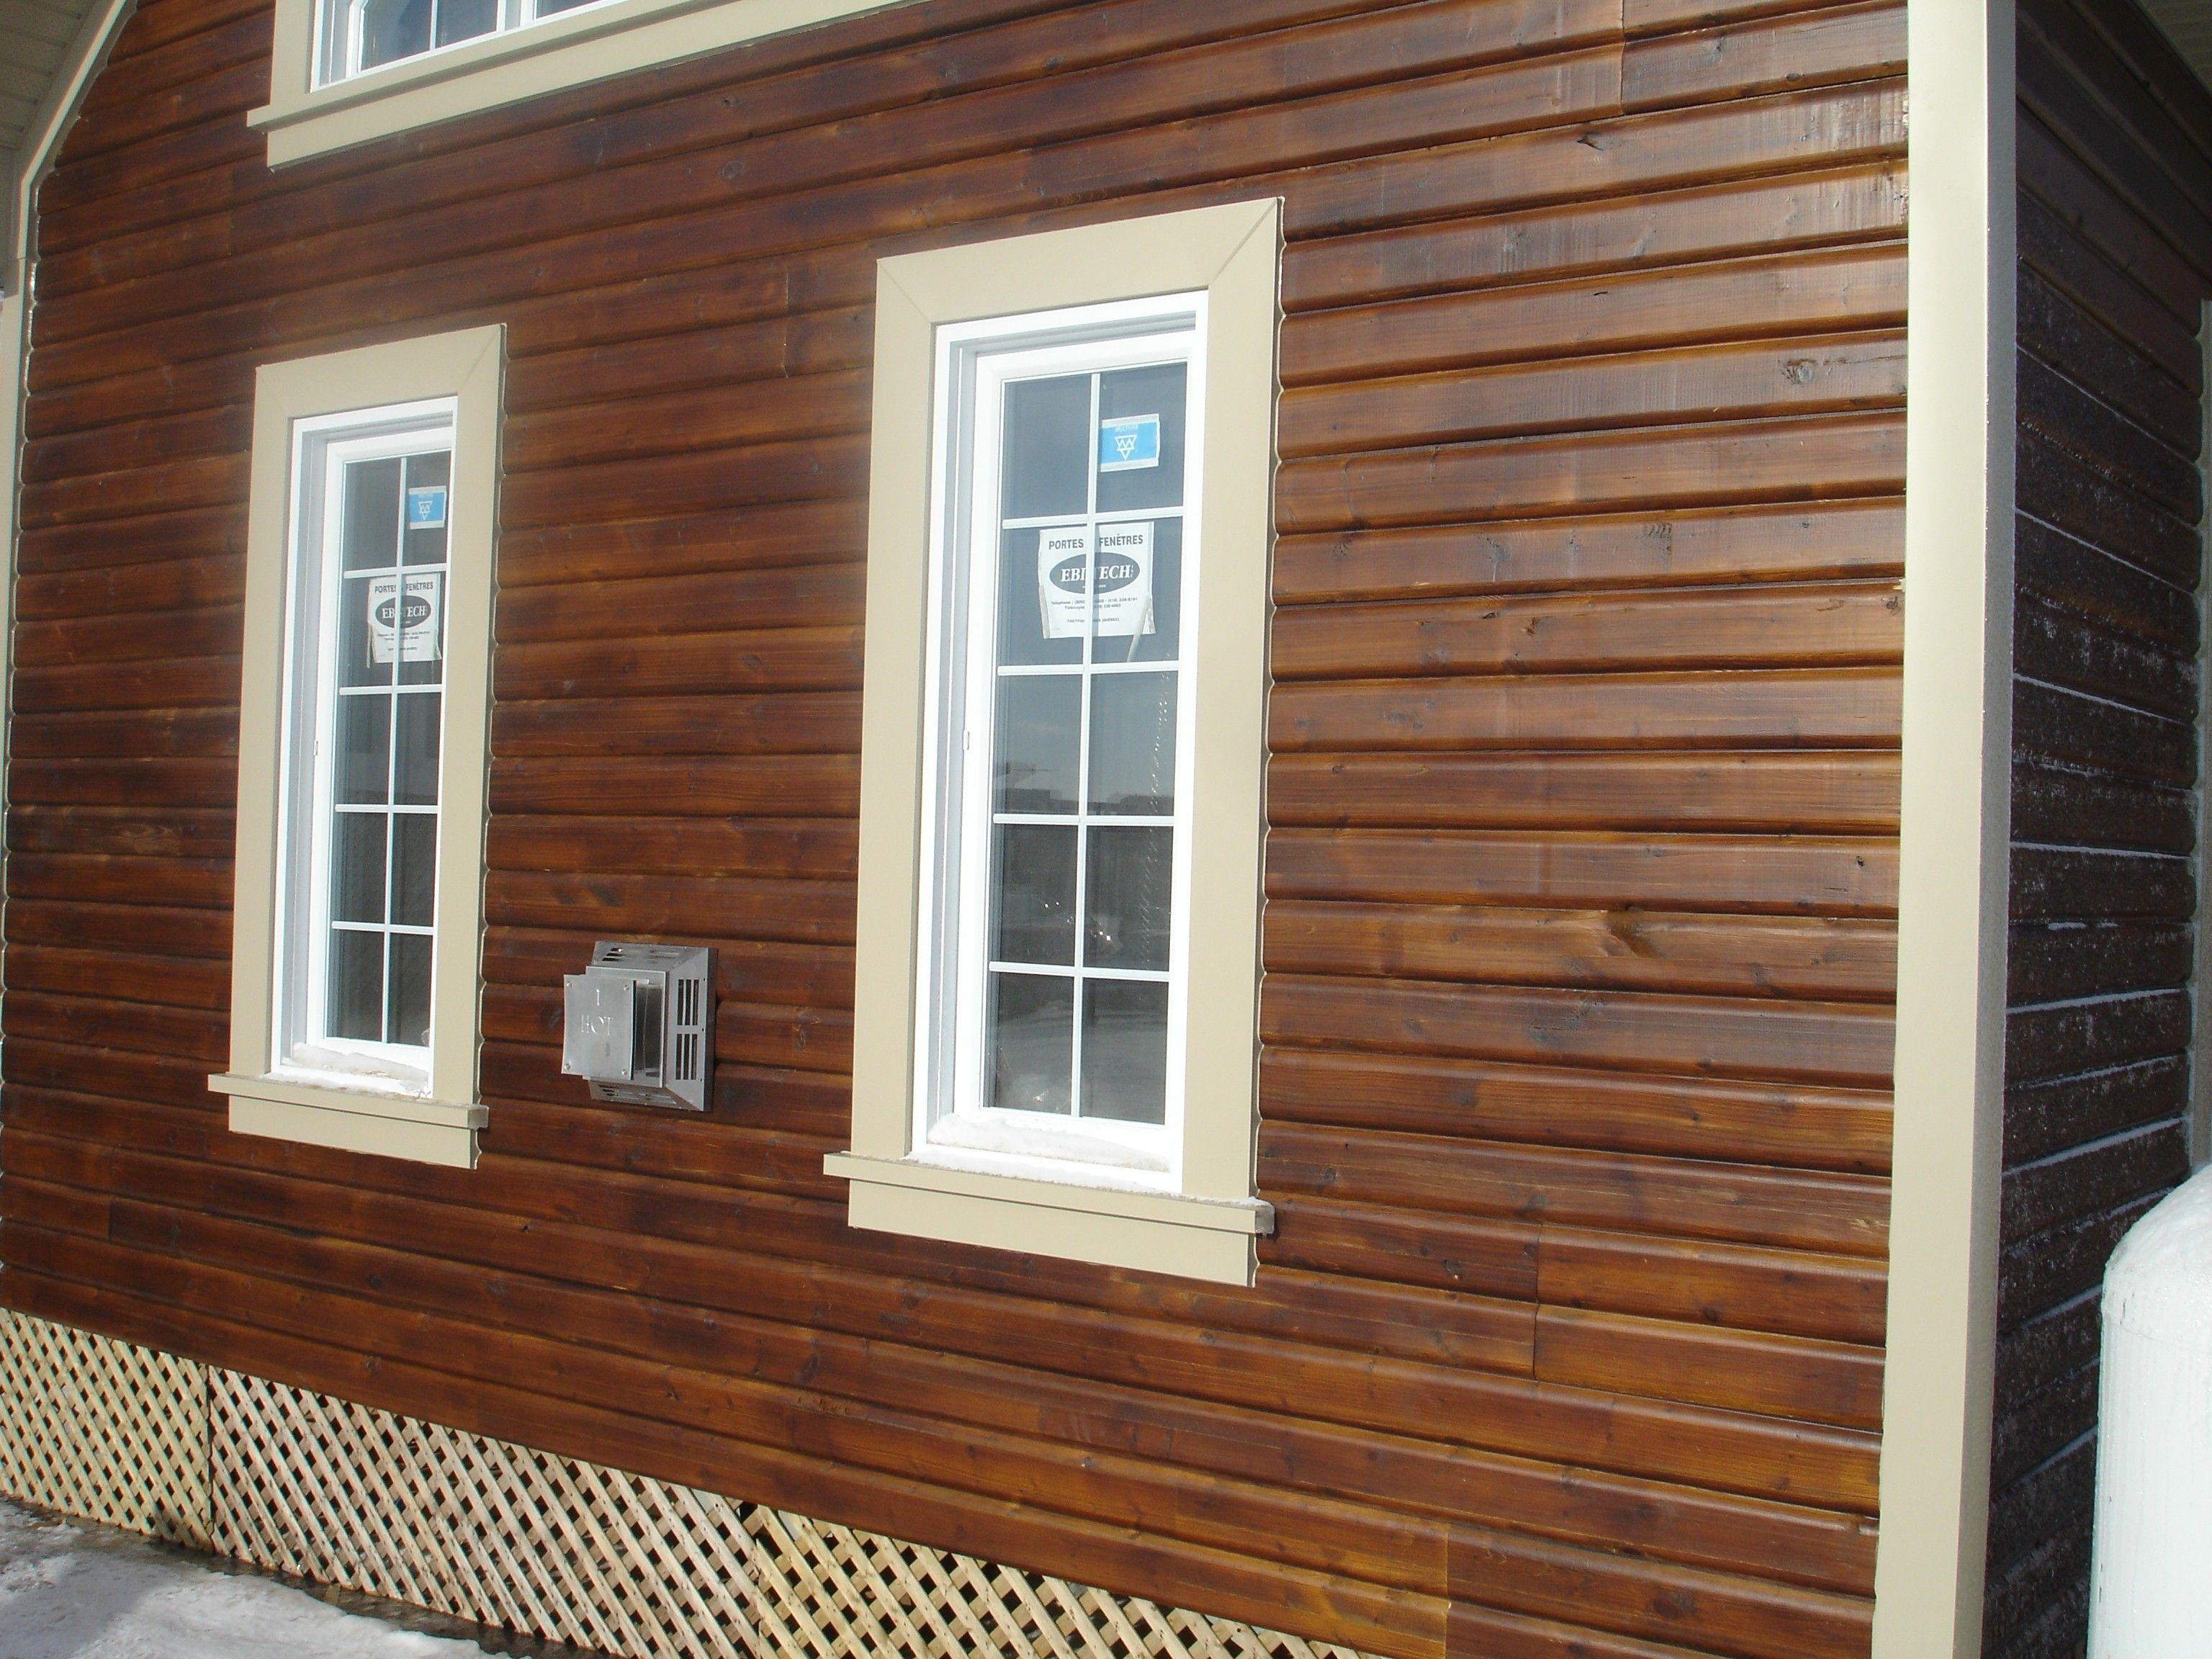 Selecting A Cedar Shingle Siding House Exterior This Old House Wood Siding House Wood Siding Exterior Wood Sideboard